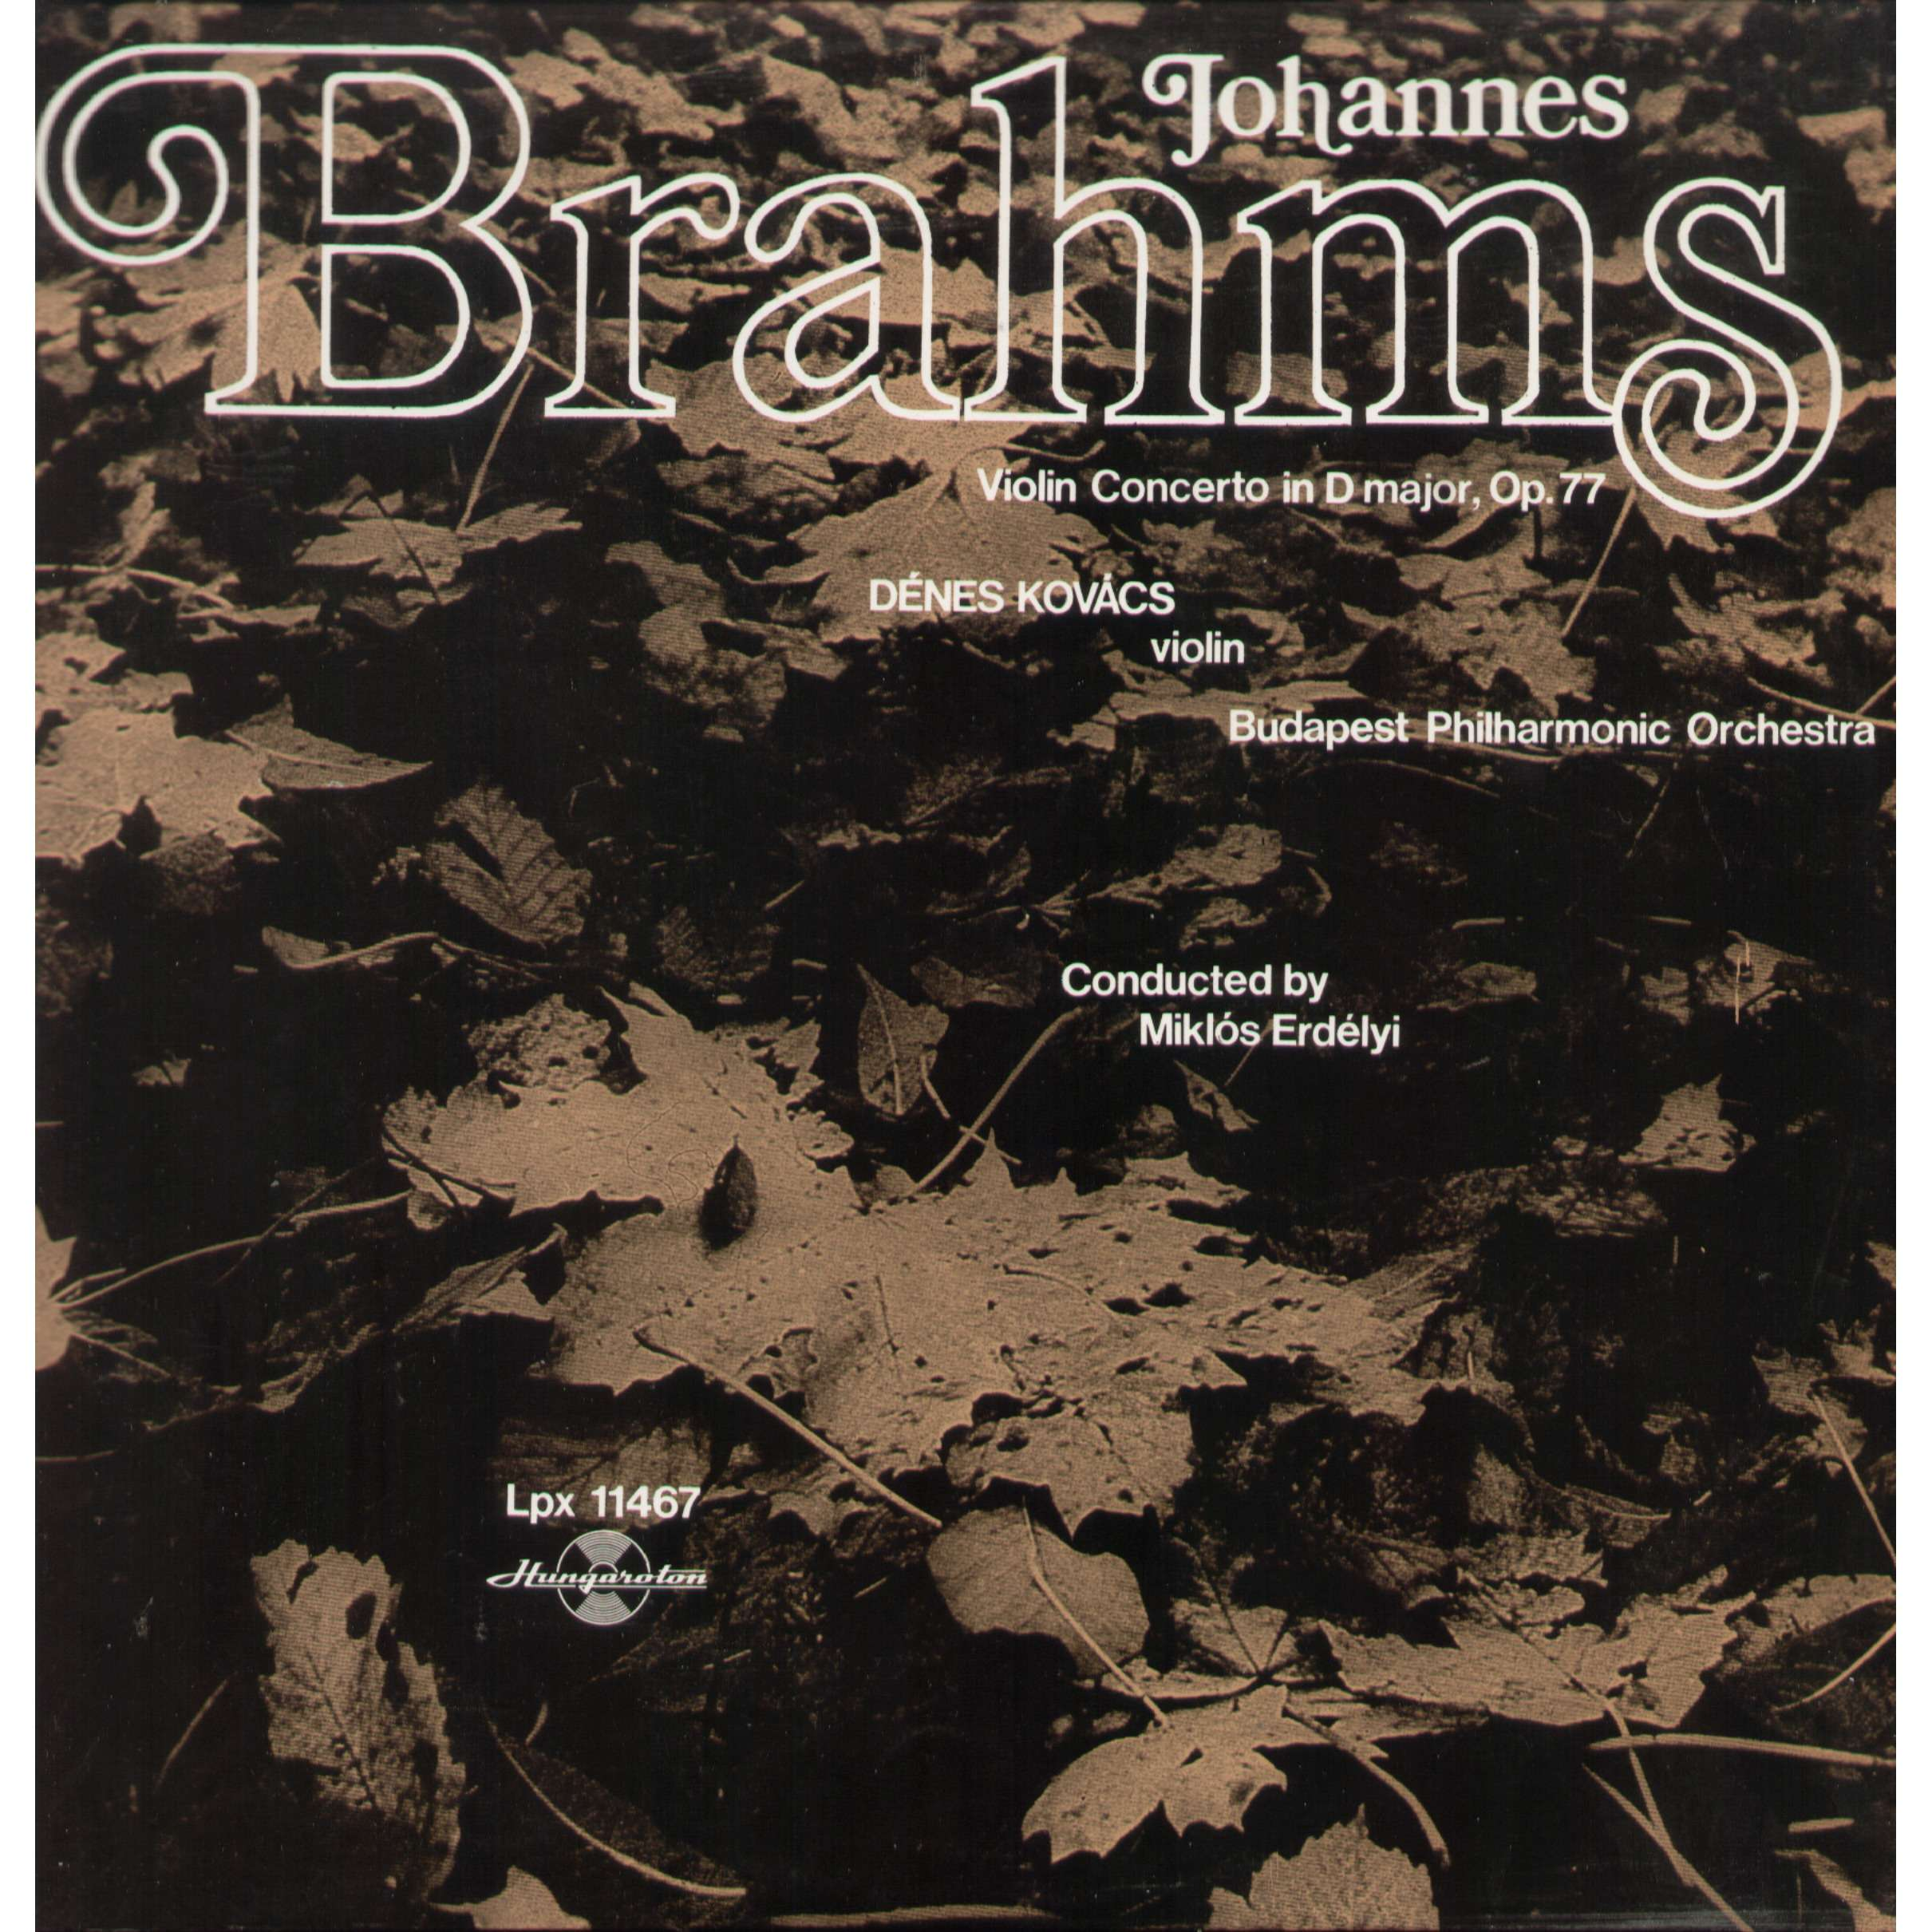 johannes brahms-denes kovacs violin concerto in D major, op.77